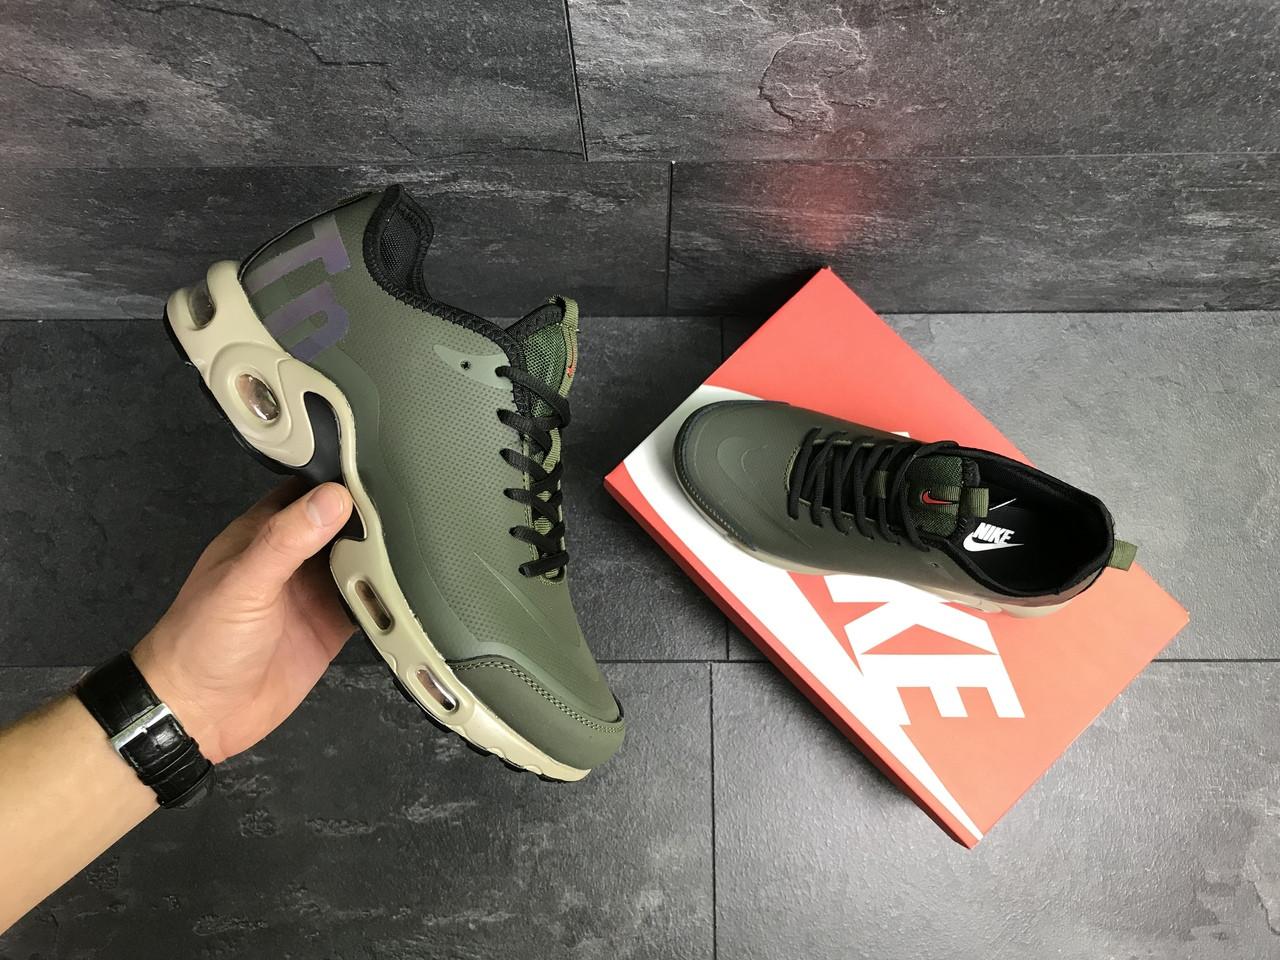 567722cb Я в шоке!™ | Мужские кроссовки темно зеленые Nike Air Max TN 7269 ...